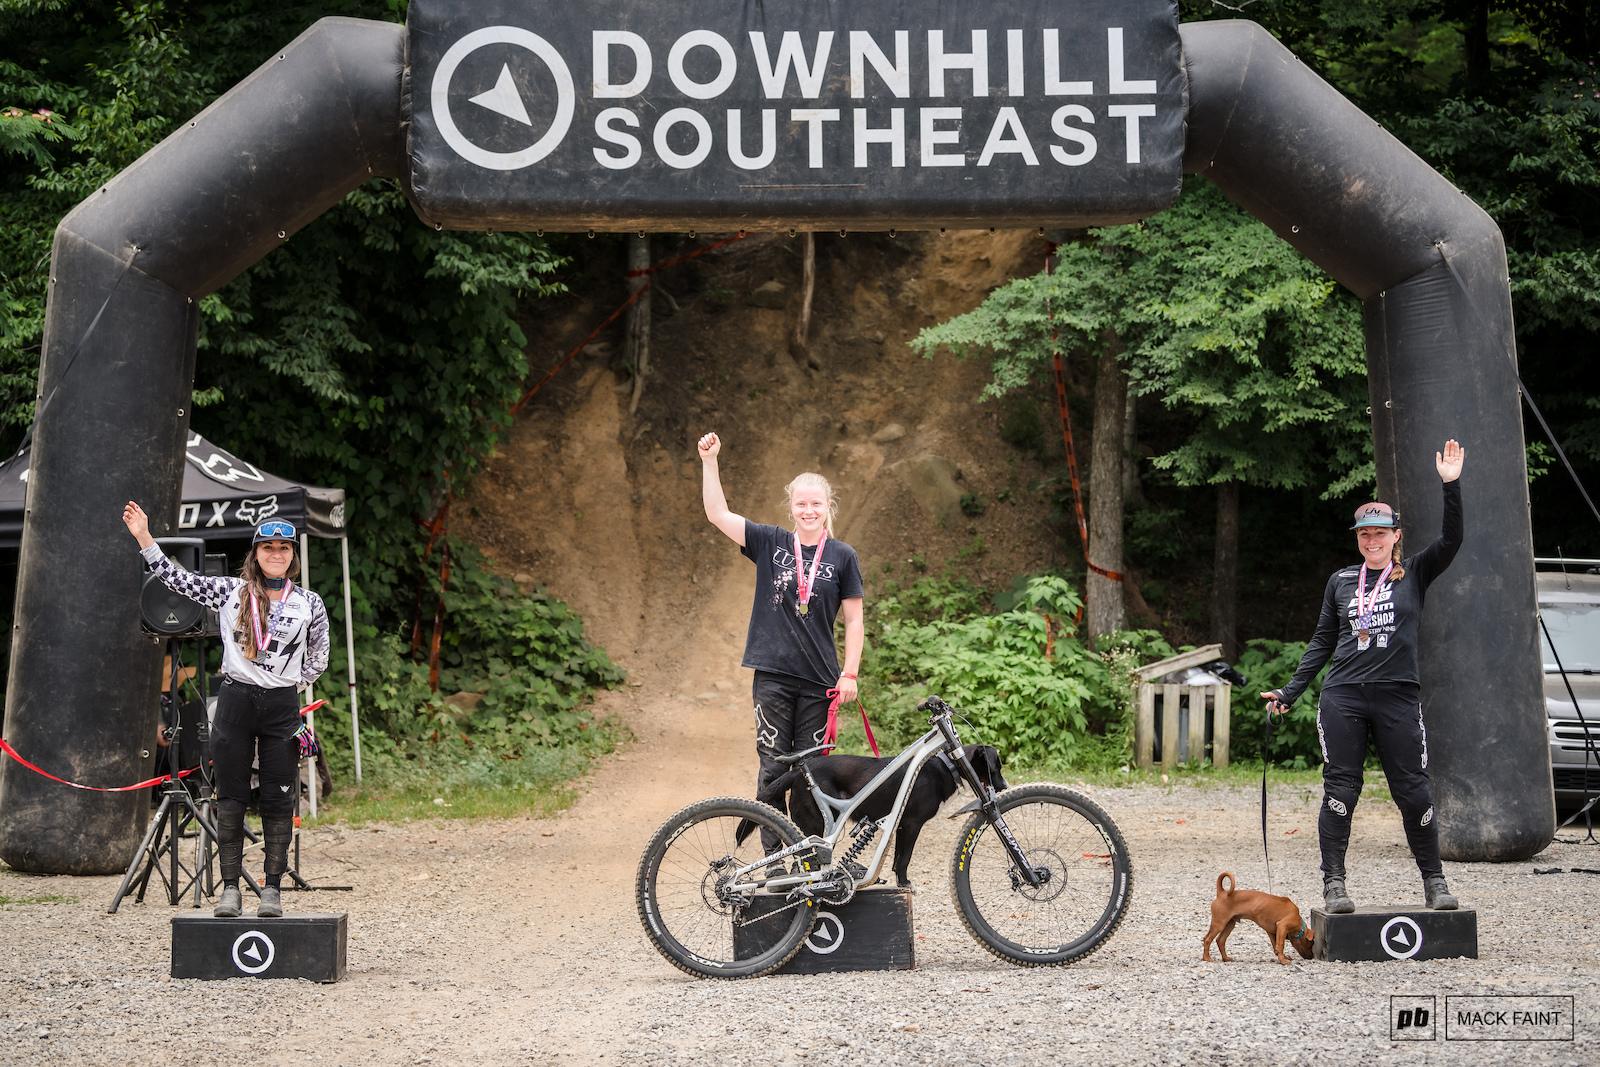 Womens Pro podium rachel must have missed the dog memo.